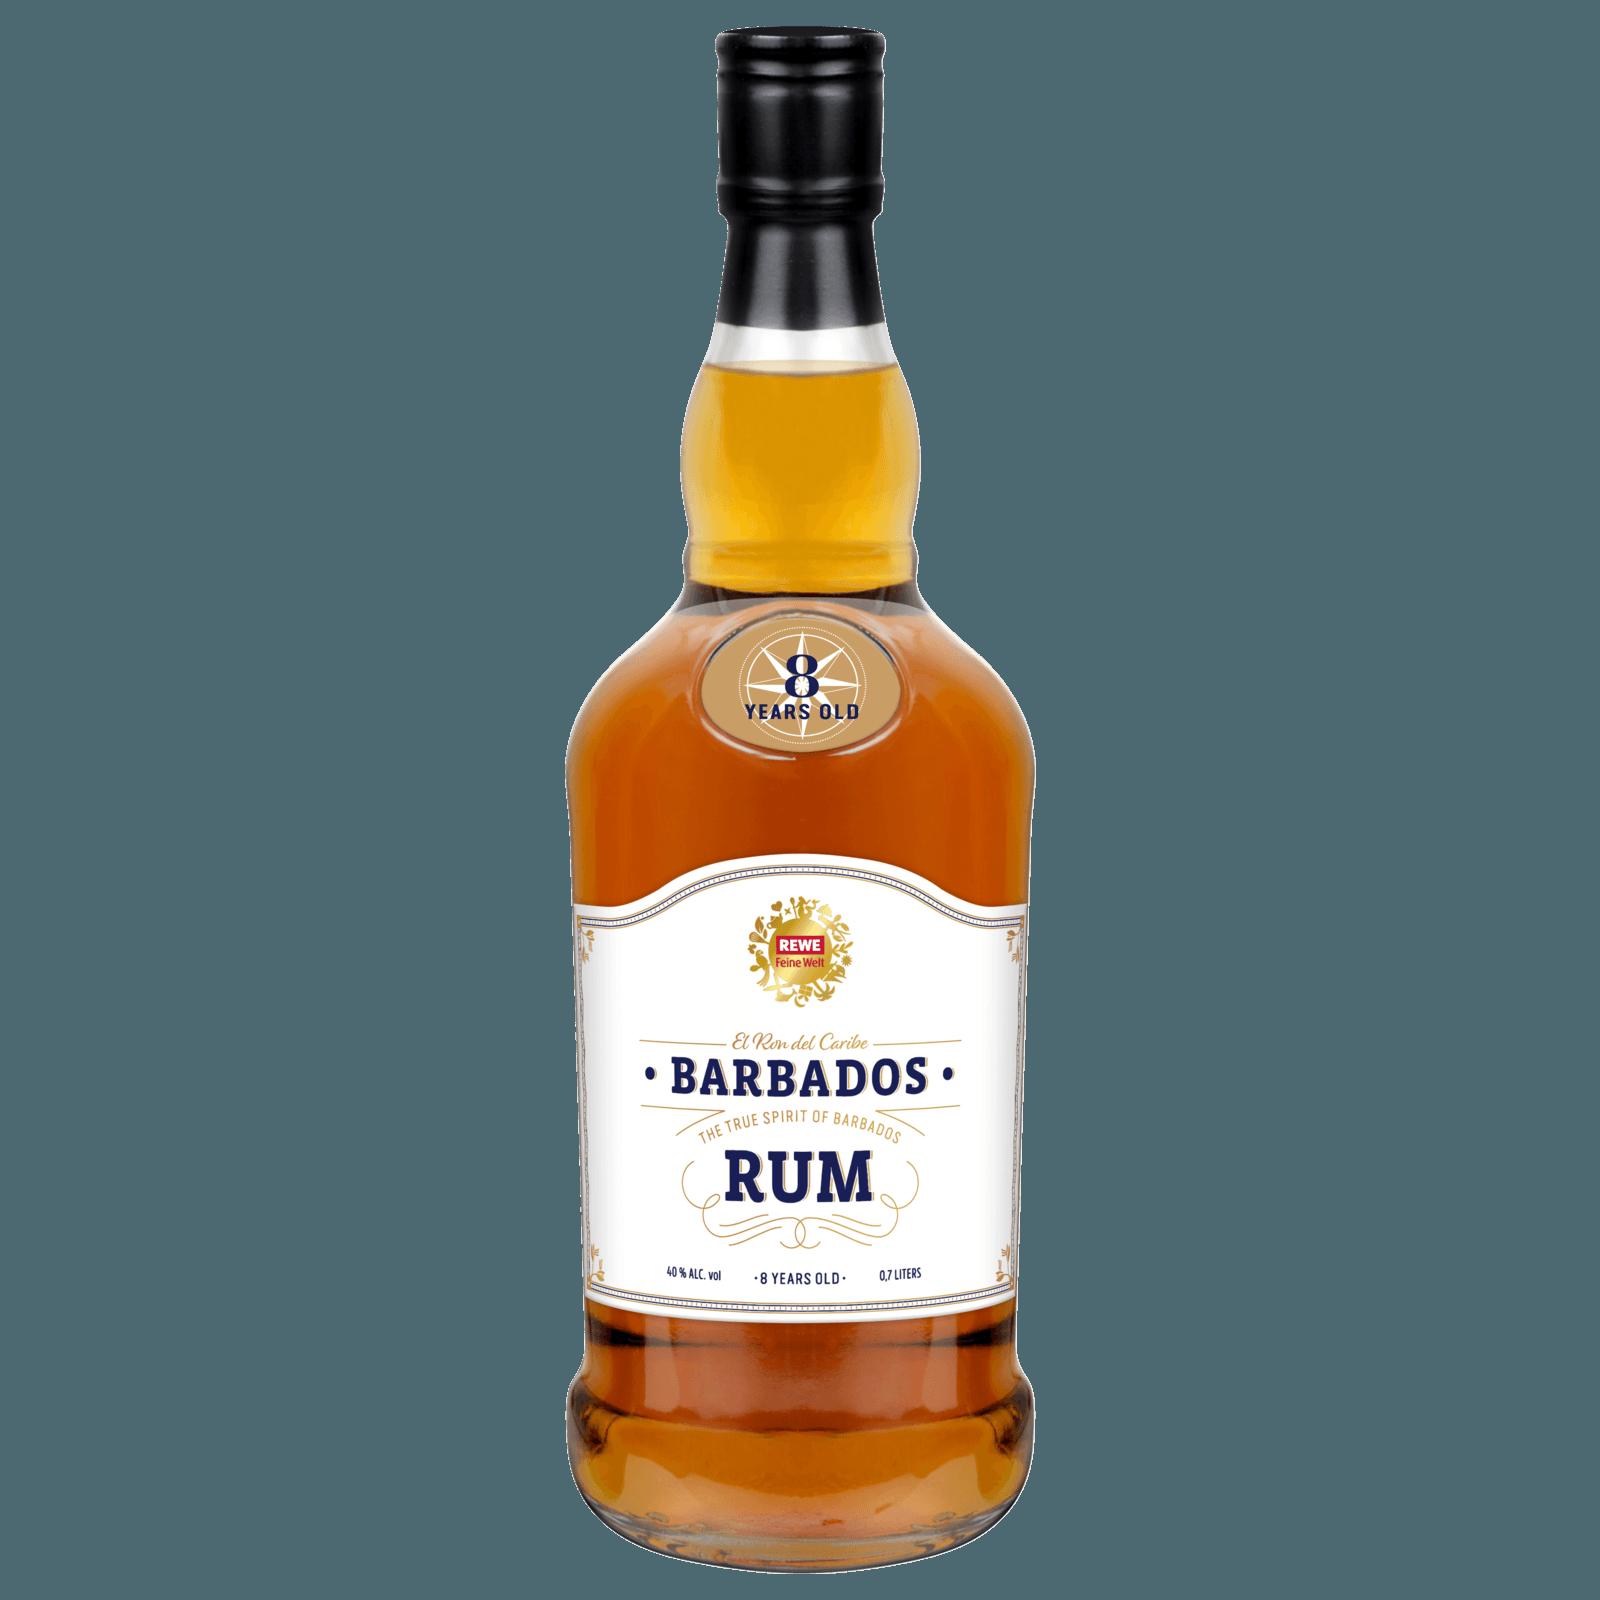 REWE Feine Welt Barbados Rum 0,7l